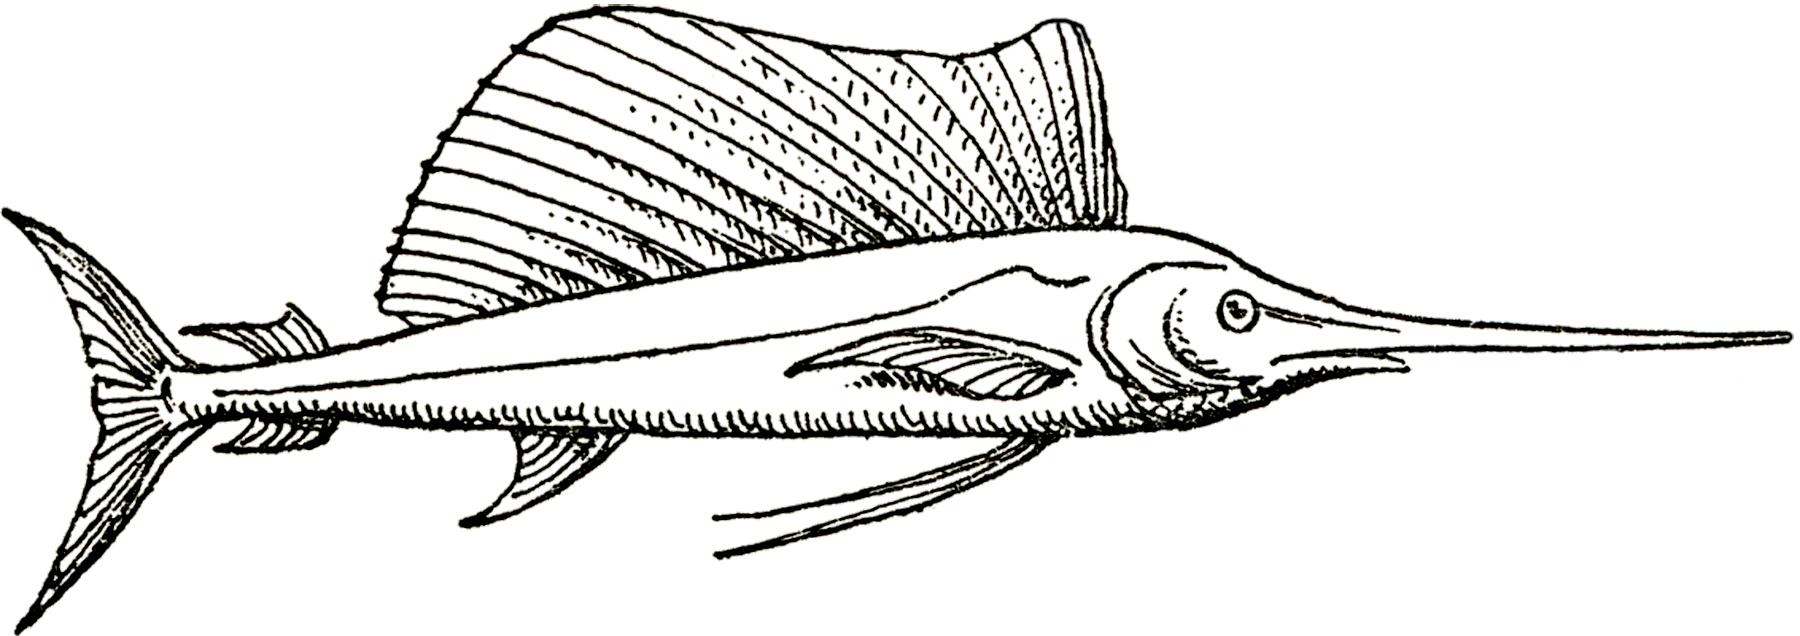 vintage swordfish image the graphics fairy